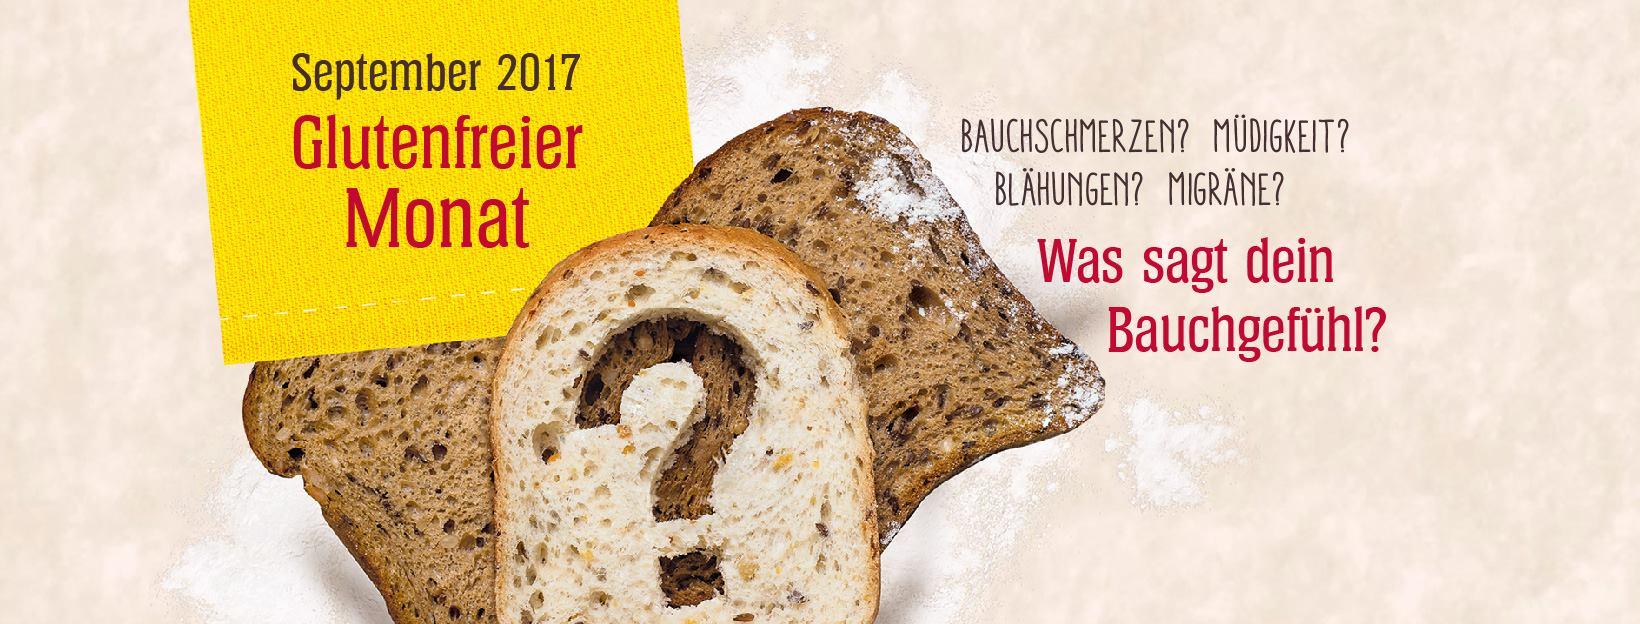 Schaer_Glutenfreier_Monat_2017